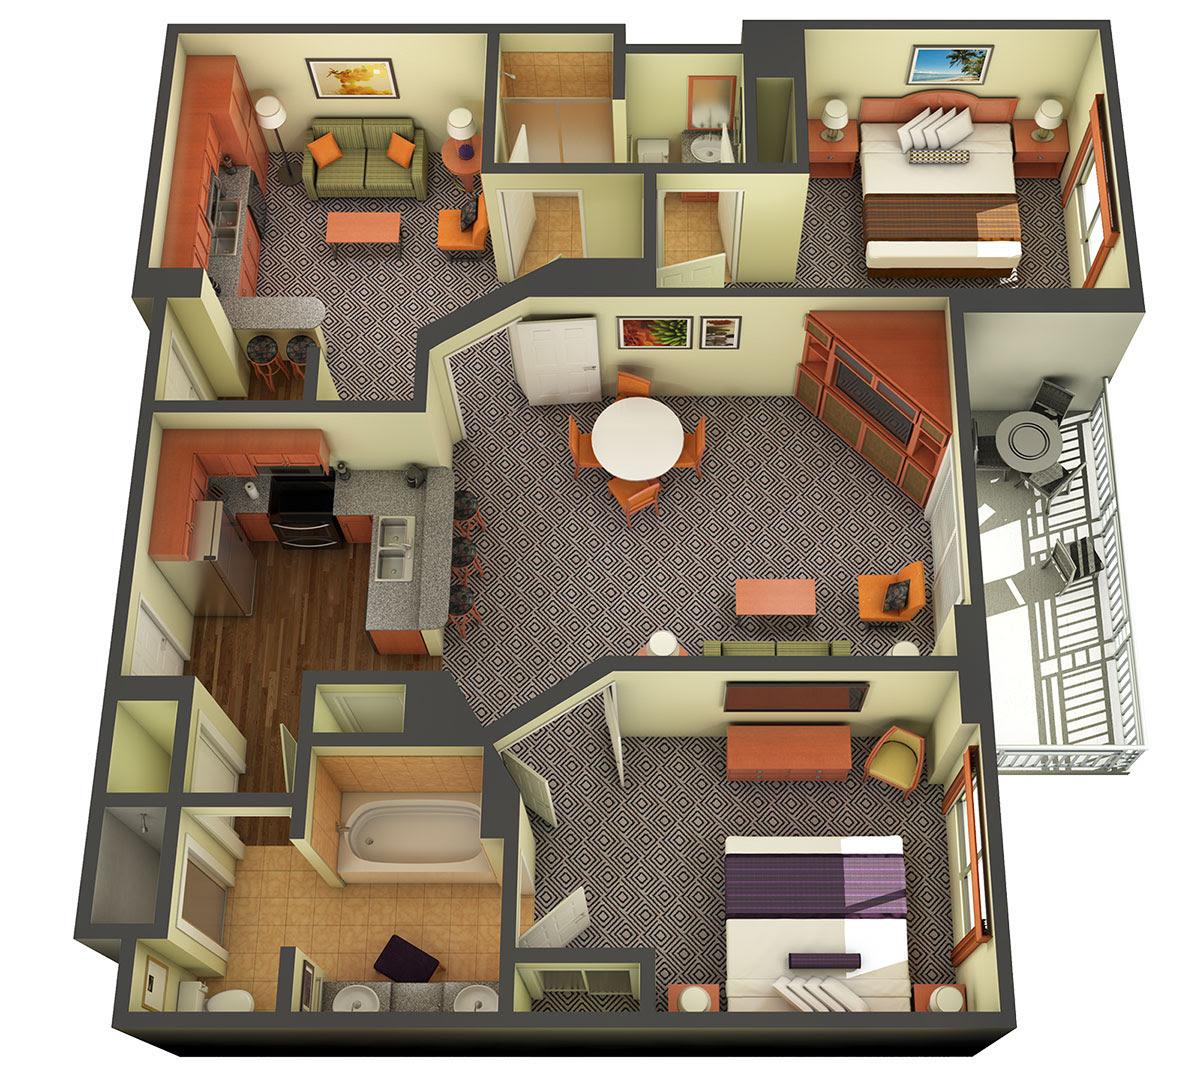 Astonishing Best Photo Of 2 Bedroom Suites In Las Vegas Sharon Norwood Download Free Architecture Designs Licukmadebymaigaardcom